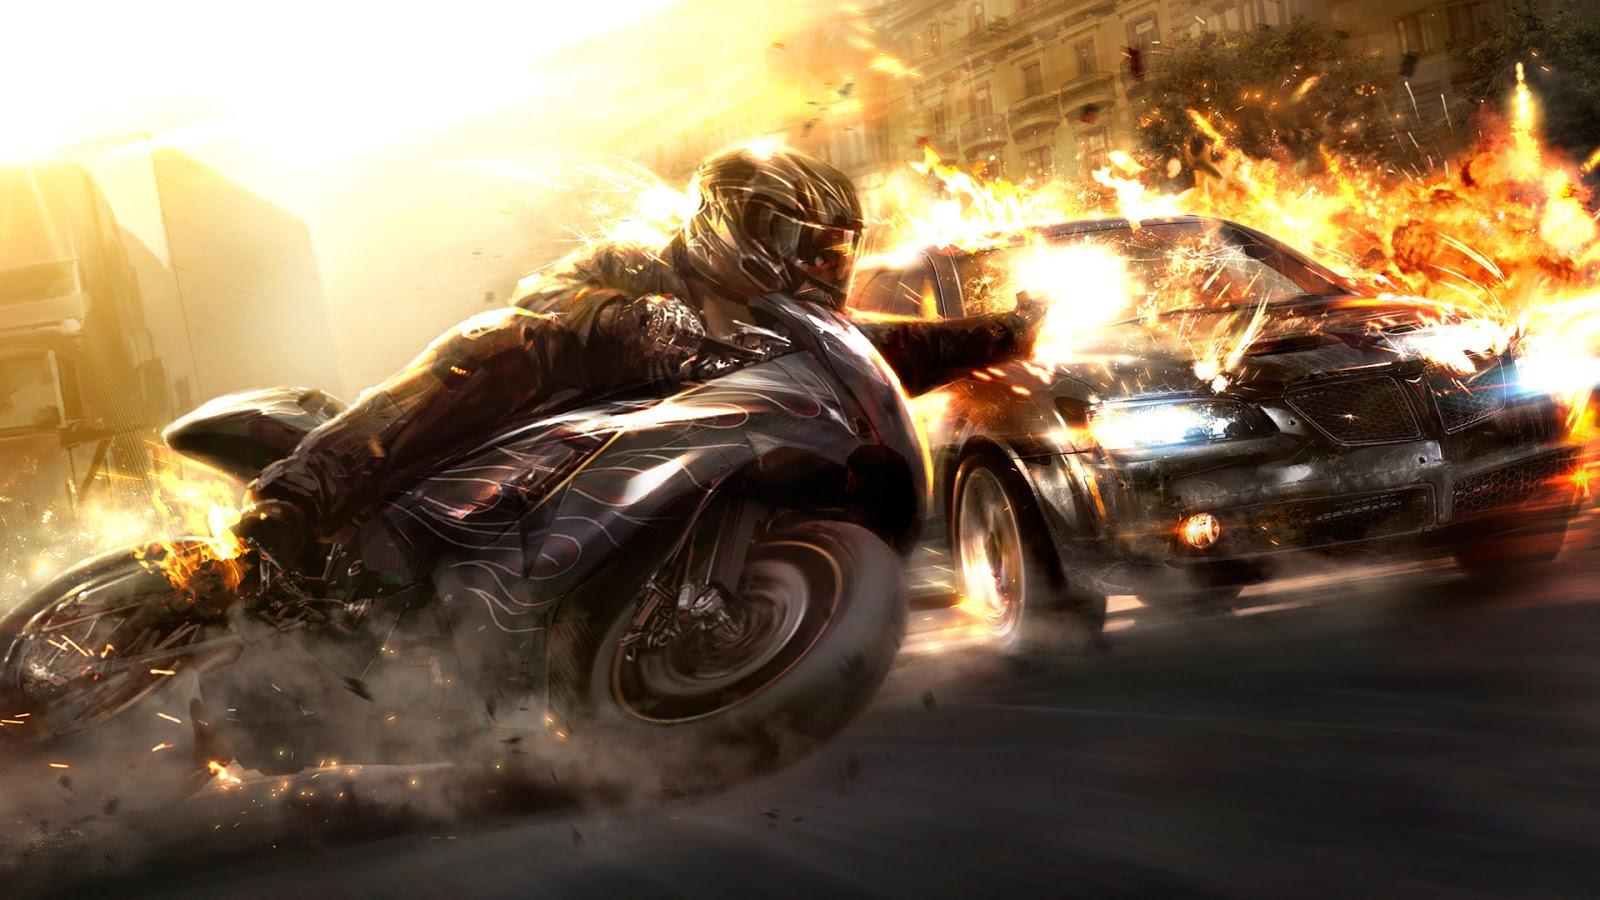 Bike And Speedy Car On Fire Hot Cars